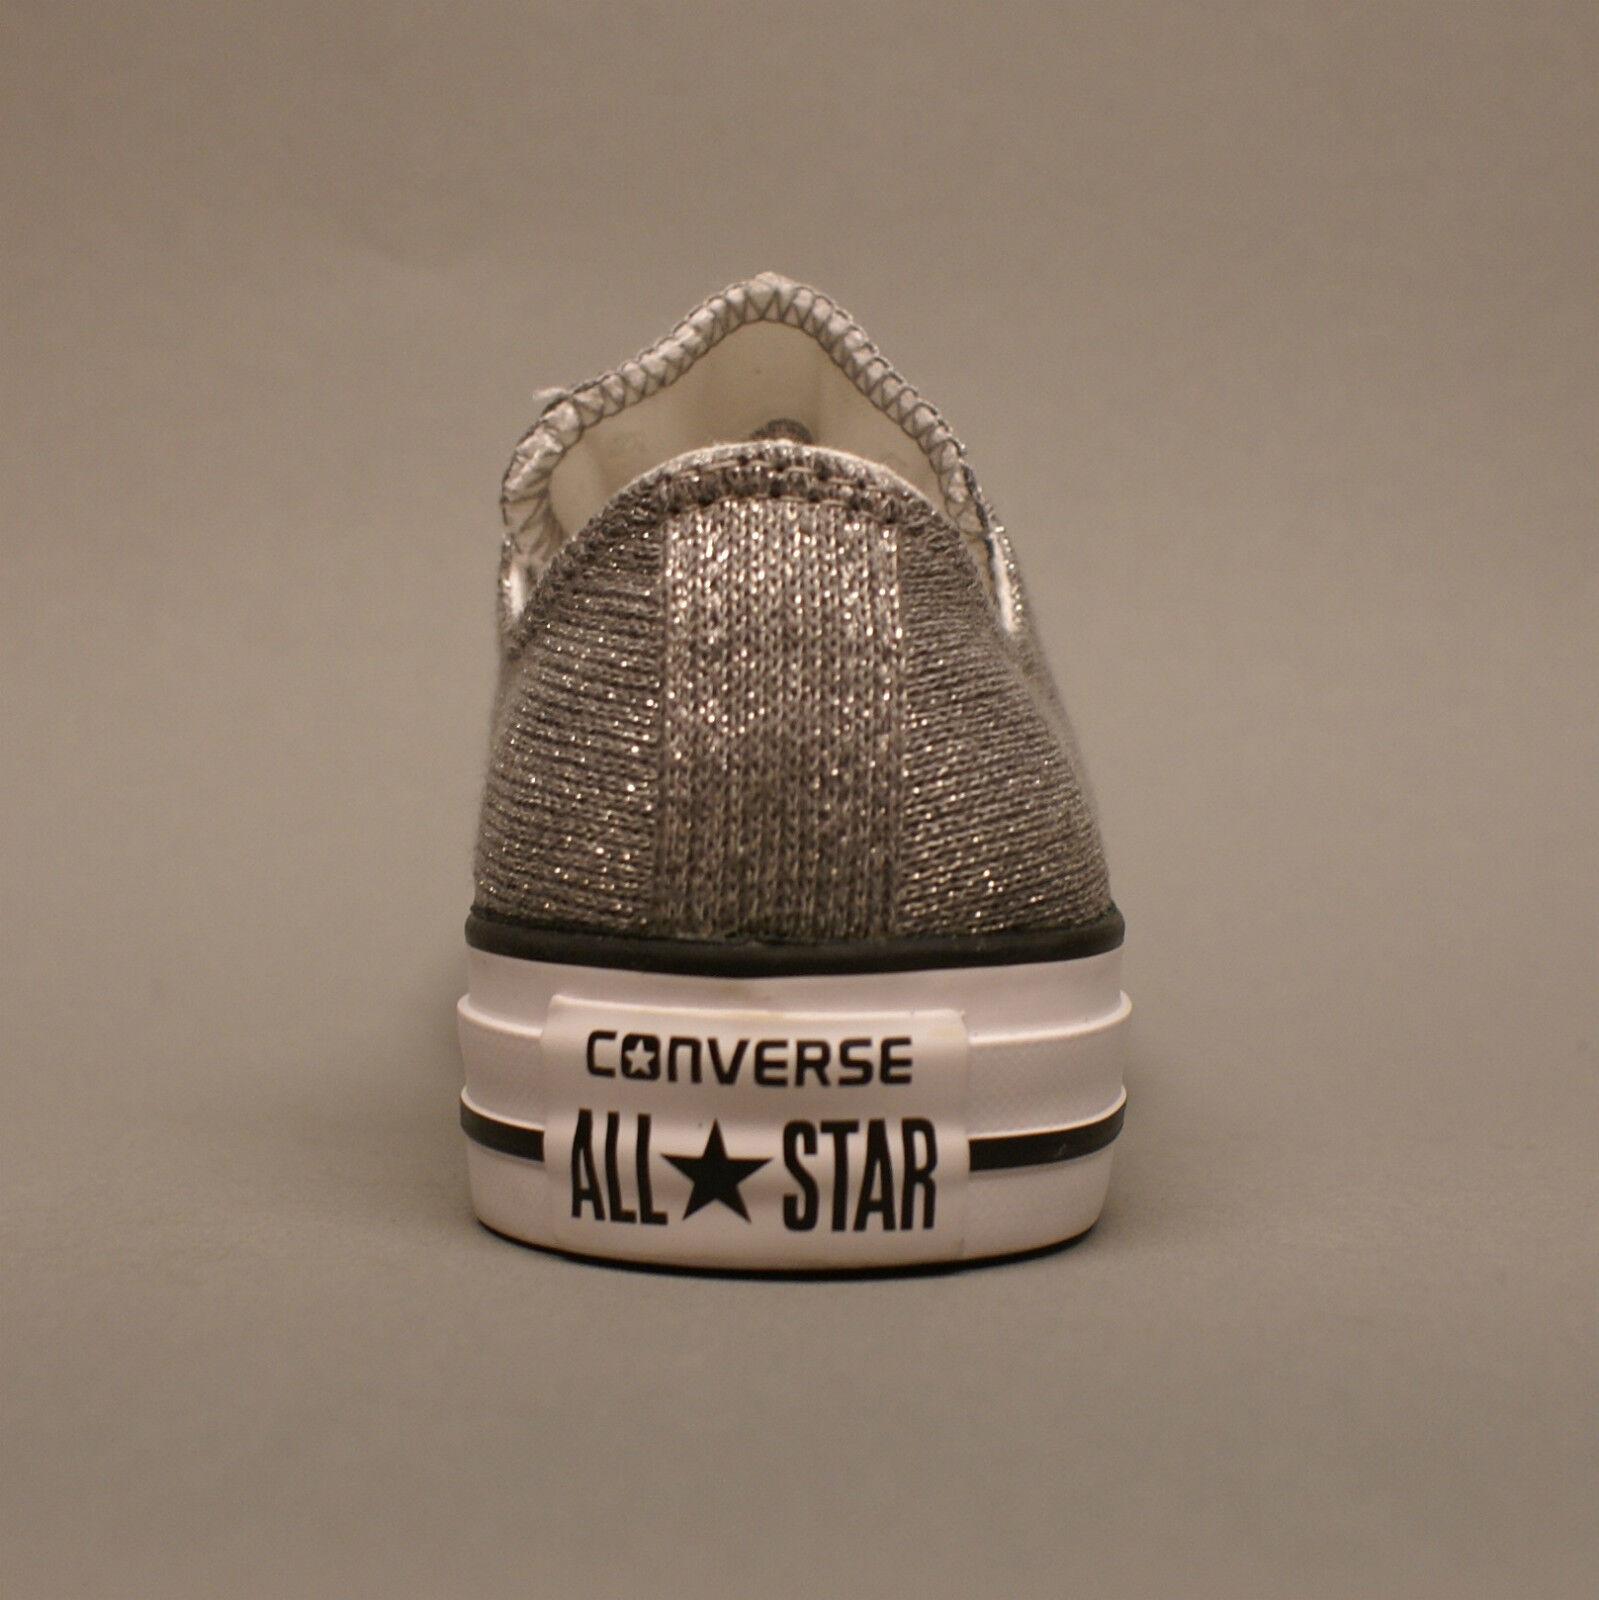 competitive price 631e0 30a0a ... NIKE NIKE NIKE Air Max LTD 3 Premium Men s Shoes (Size 6) White Black  ...